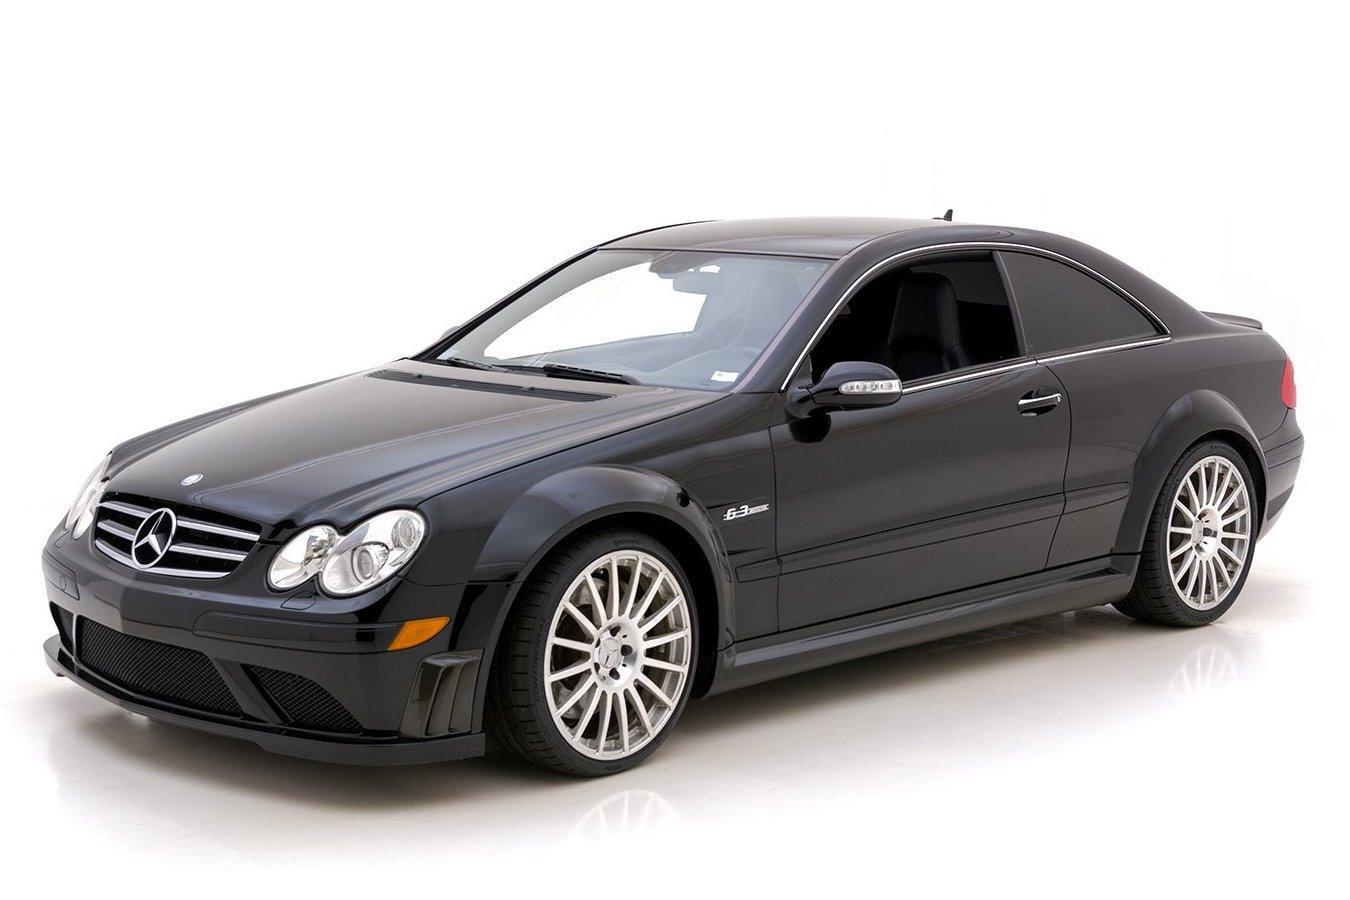 2008 Mercedes-Benz CLK 63 Black Series For Sale | Vintage Driving Machines